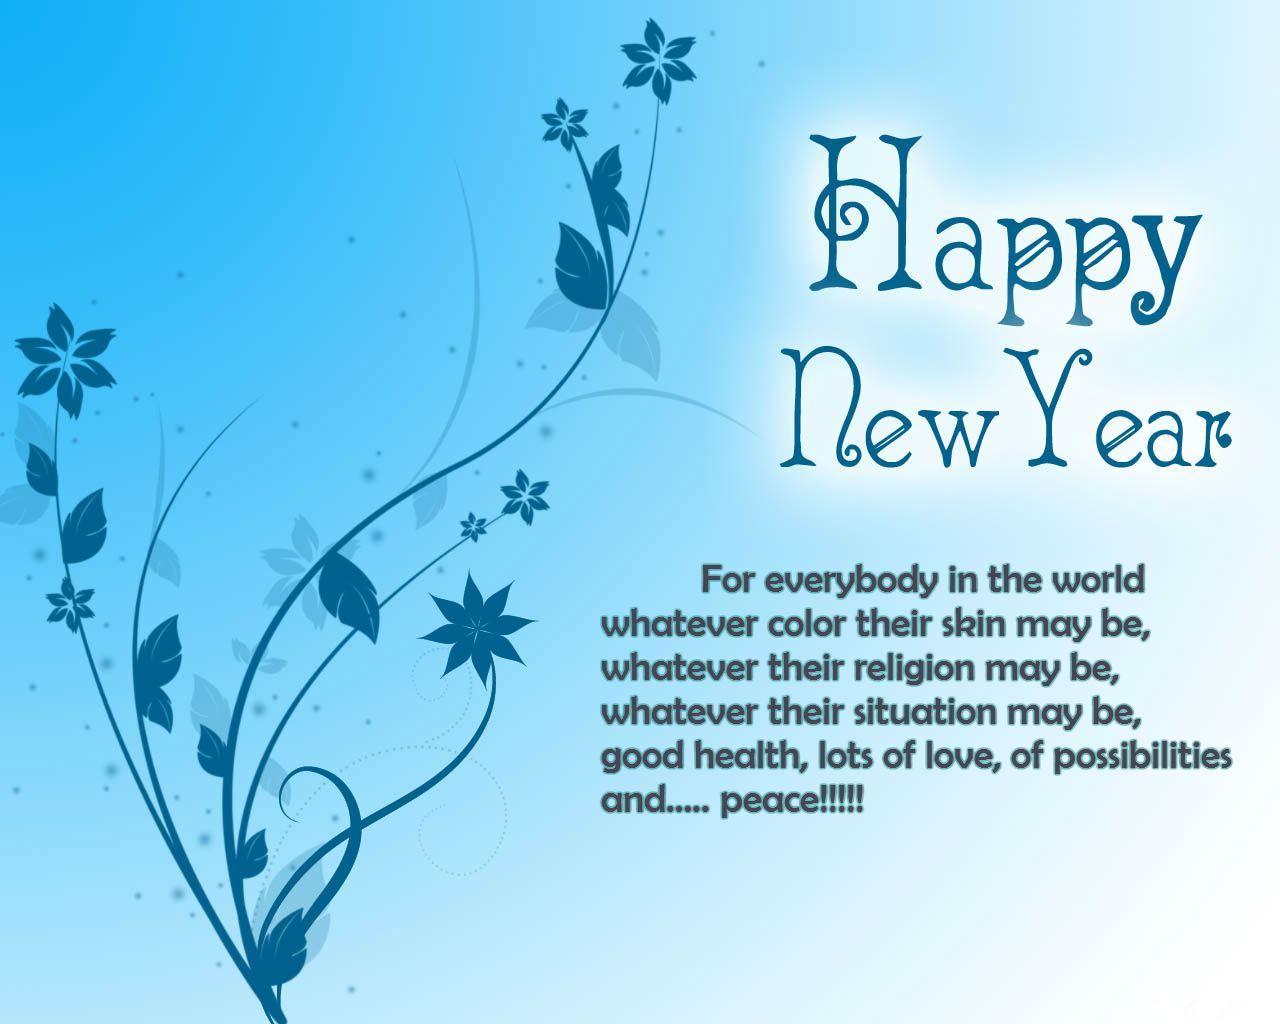 Happy New Year 2015 Telugu Photo Funia Dec 18 Happy New Year Scraps